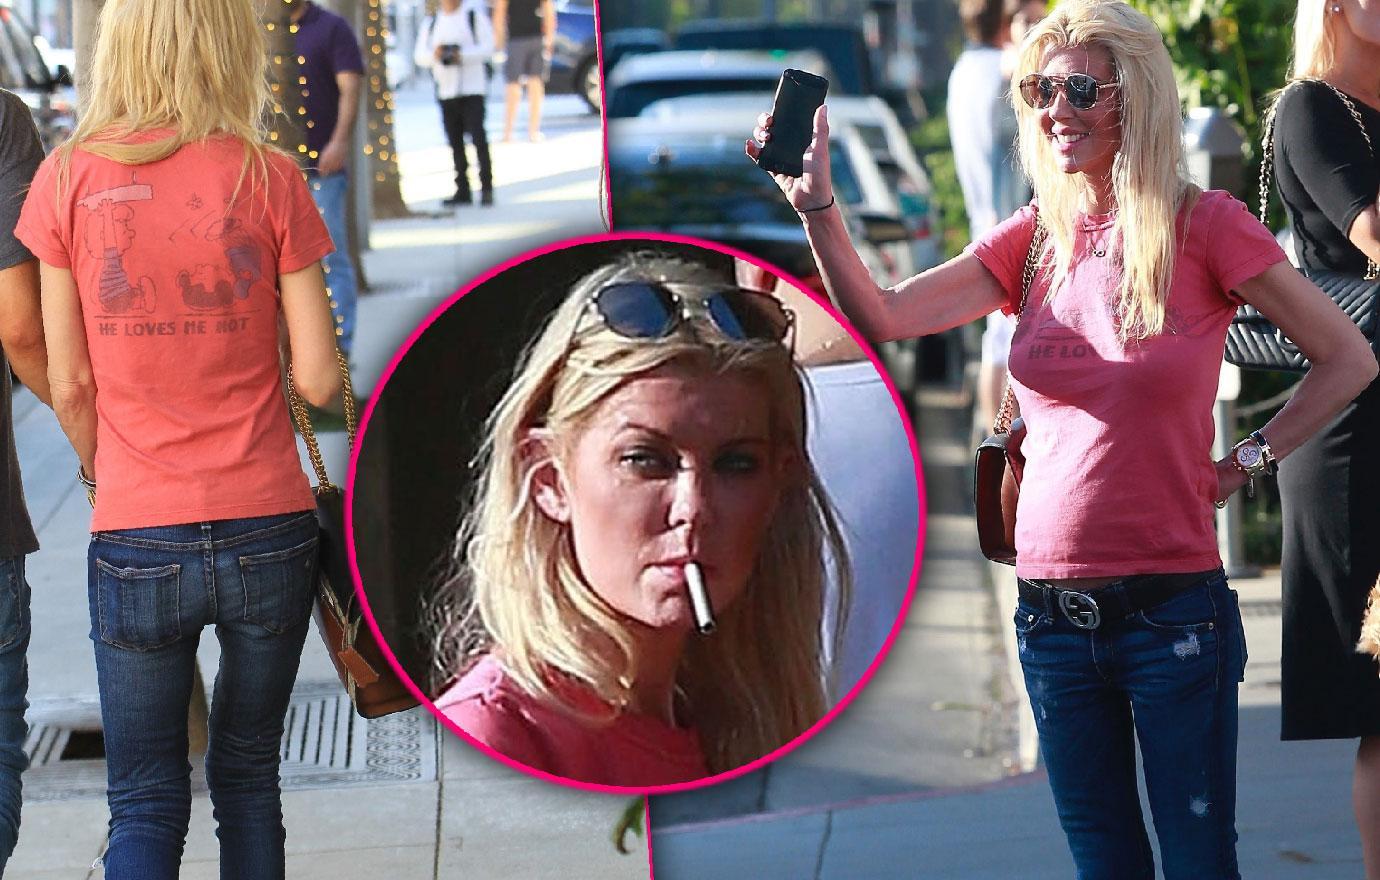 Tara Reid Looks Like Hot Mess Jewelry Shopping